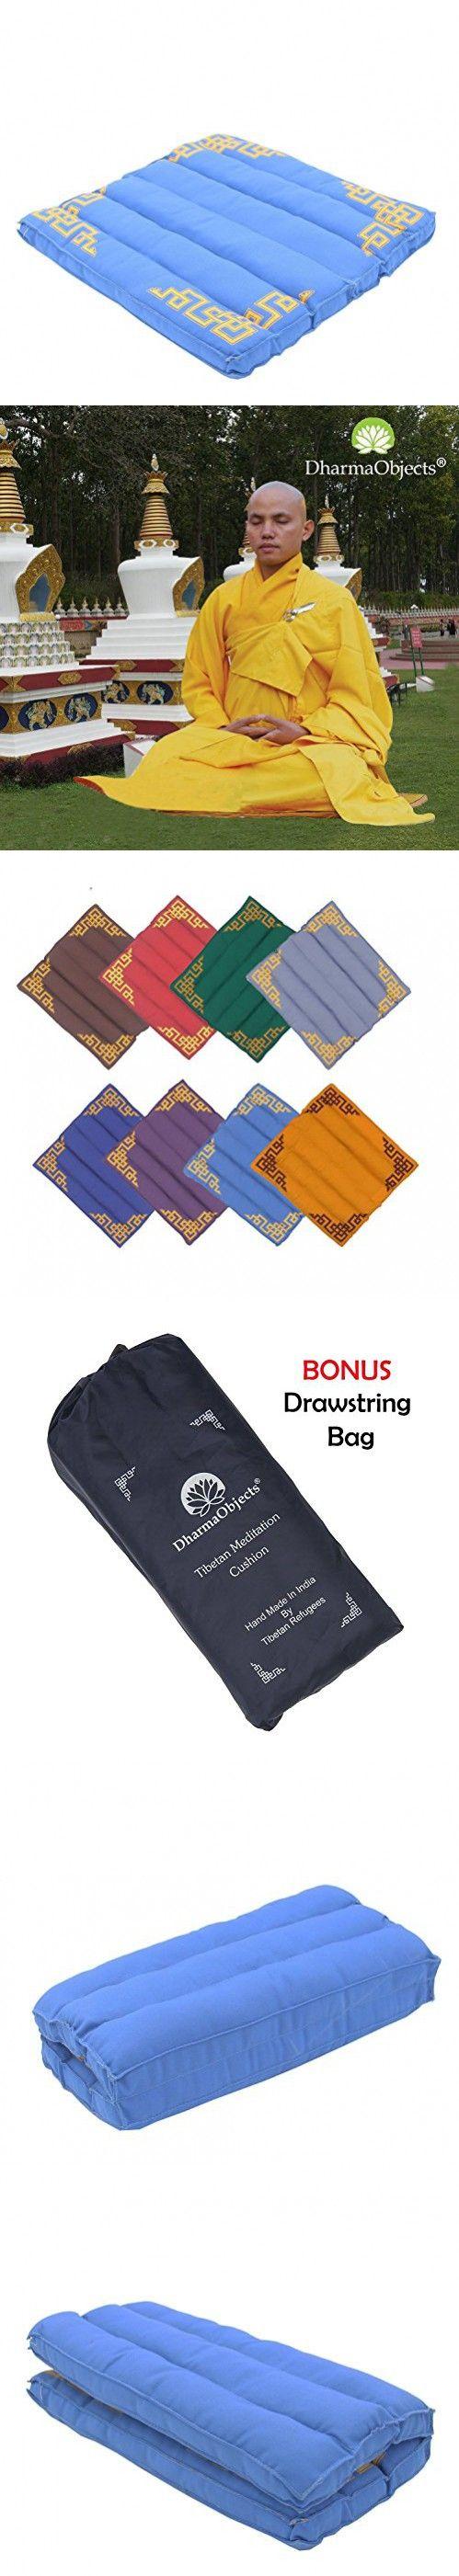 "DharmaObjects Traditional Tibetan Yoga Meditation Accessory Cotton Mat Cushion (Turquoise, 15"" X 14"" X 1.5"")"